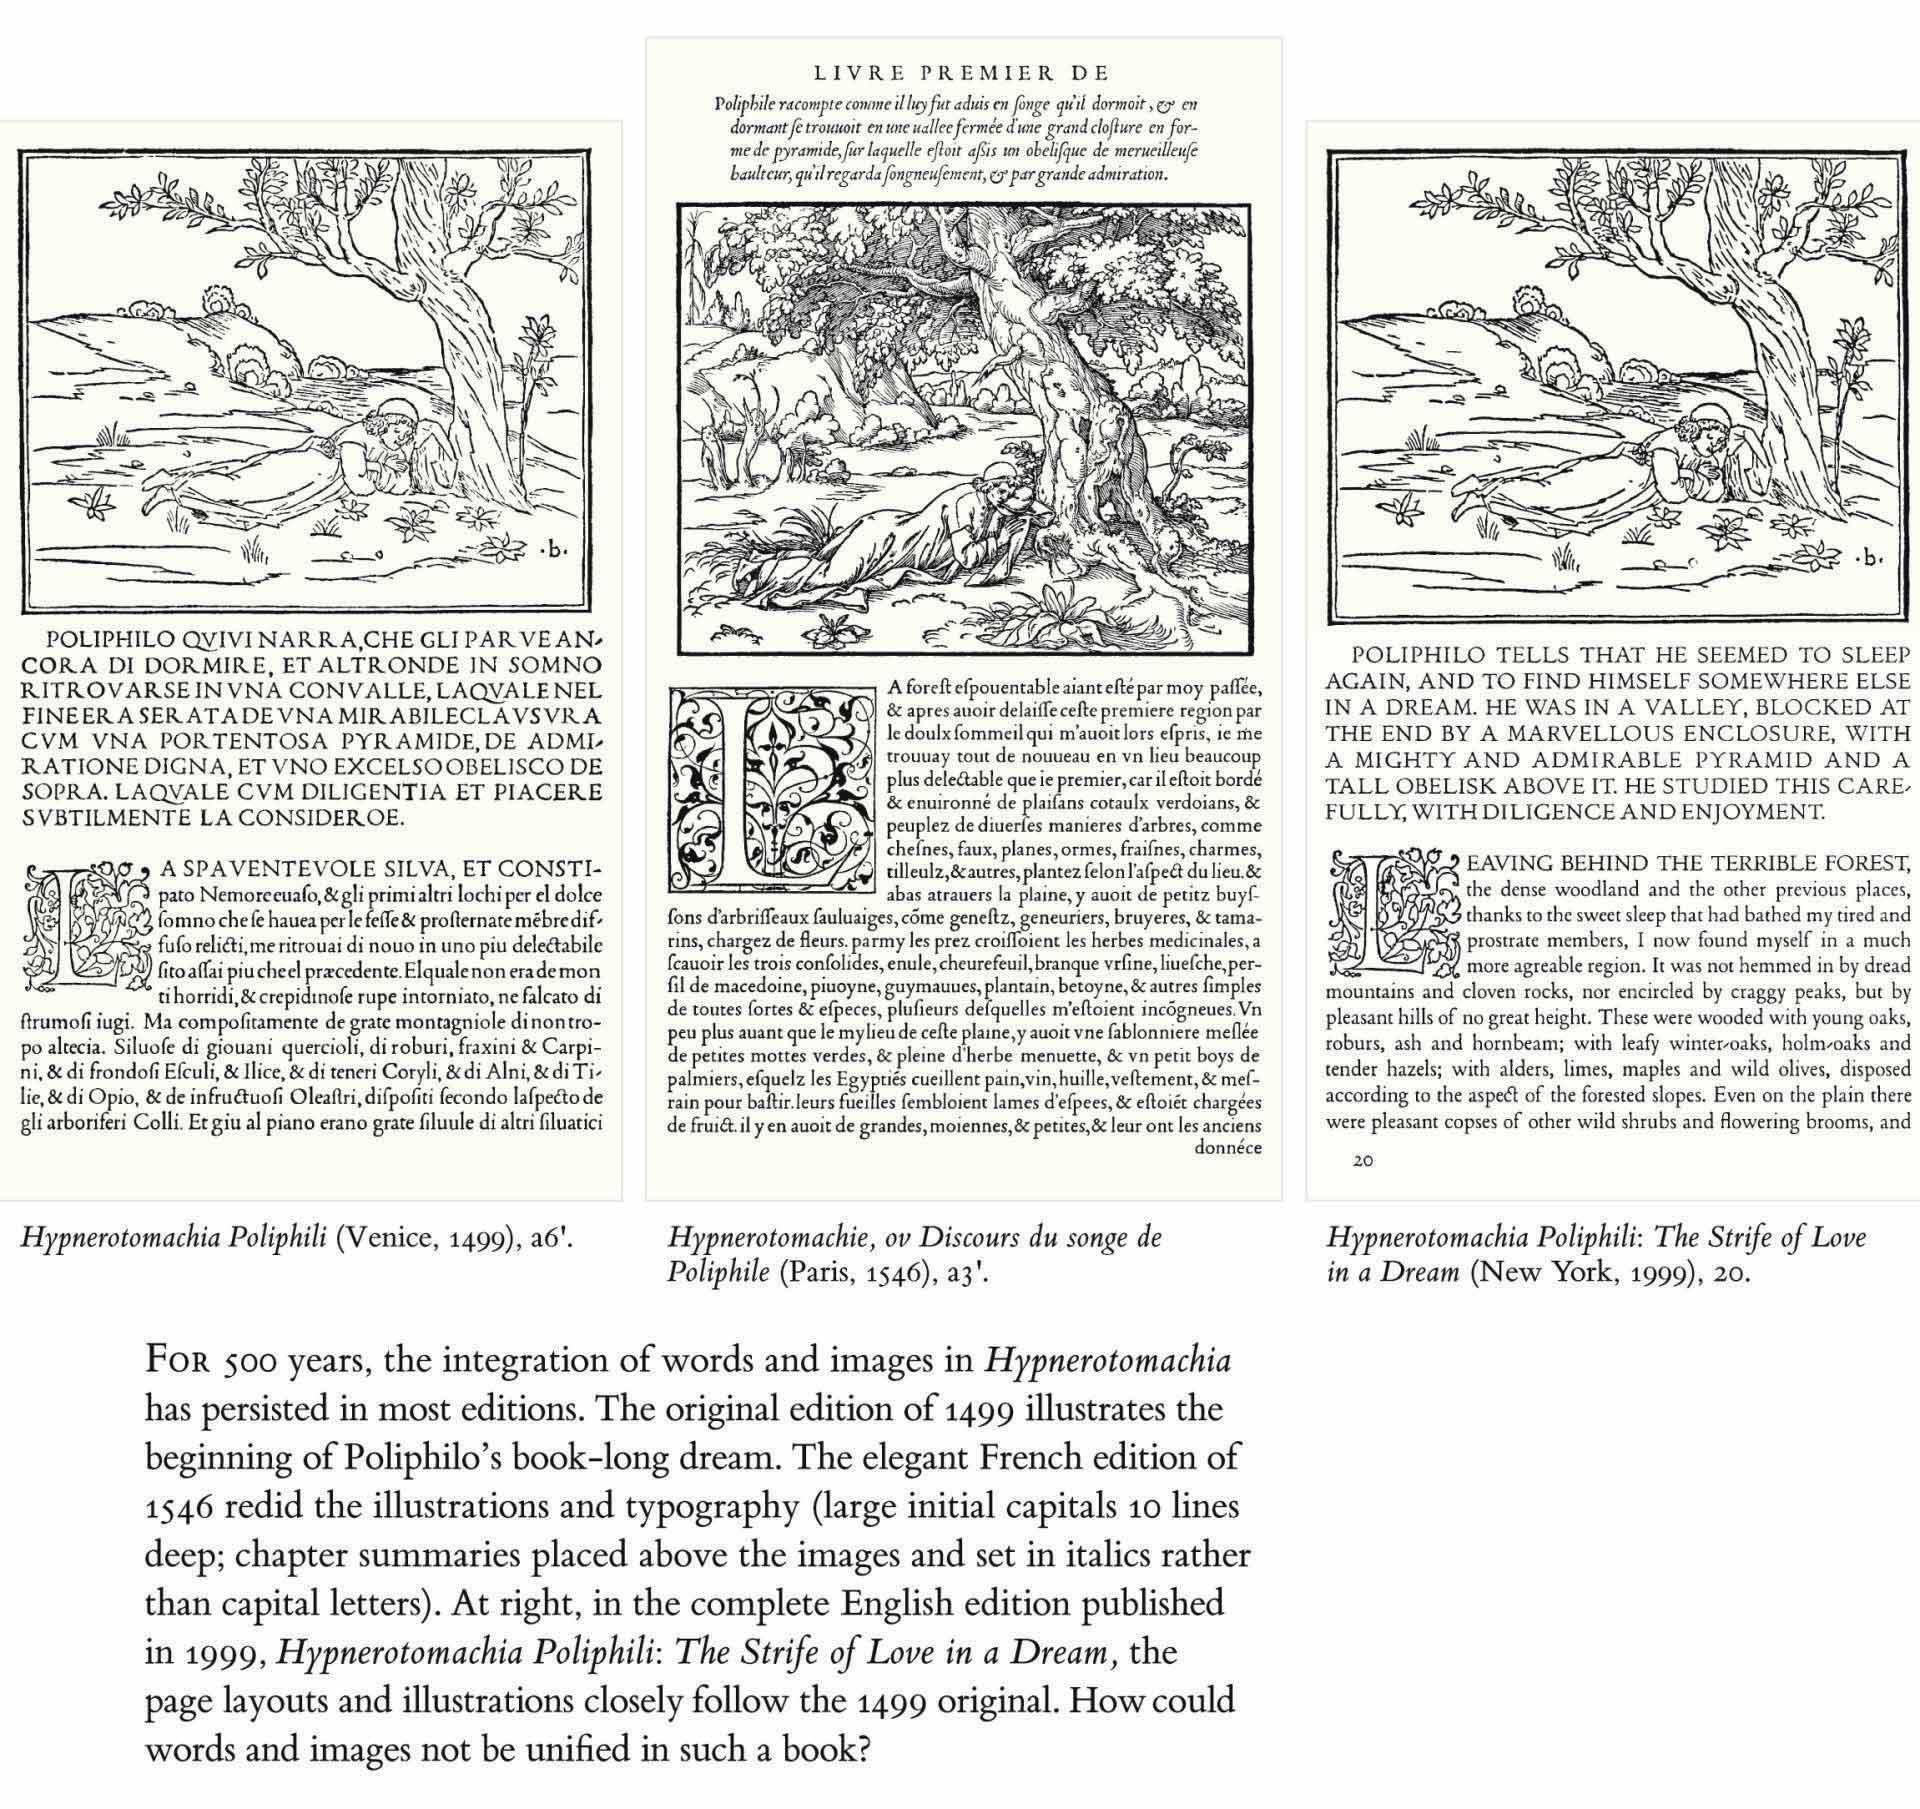 [COLONNA, Francesco]. Hypnerotomachie, ou Discours du songe de Poliphile. Anonymous translation from Latin into French, edited by Jean Martin. Paris: Louis Blaublom for Jacques Kerver, 20 August 1546.